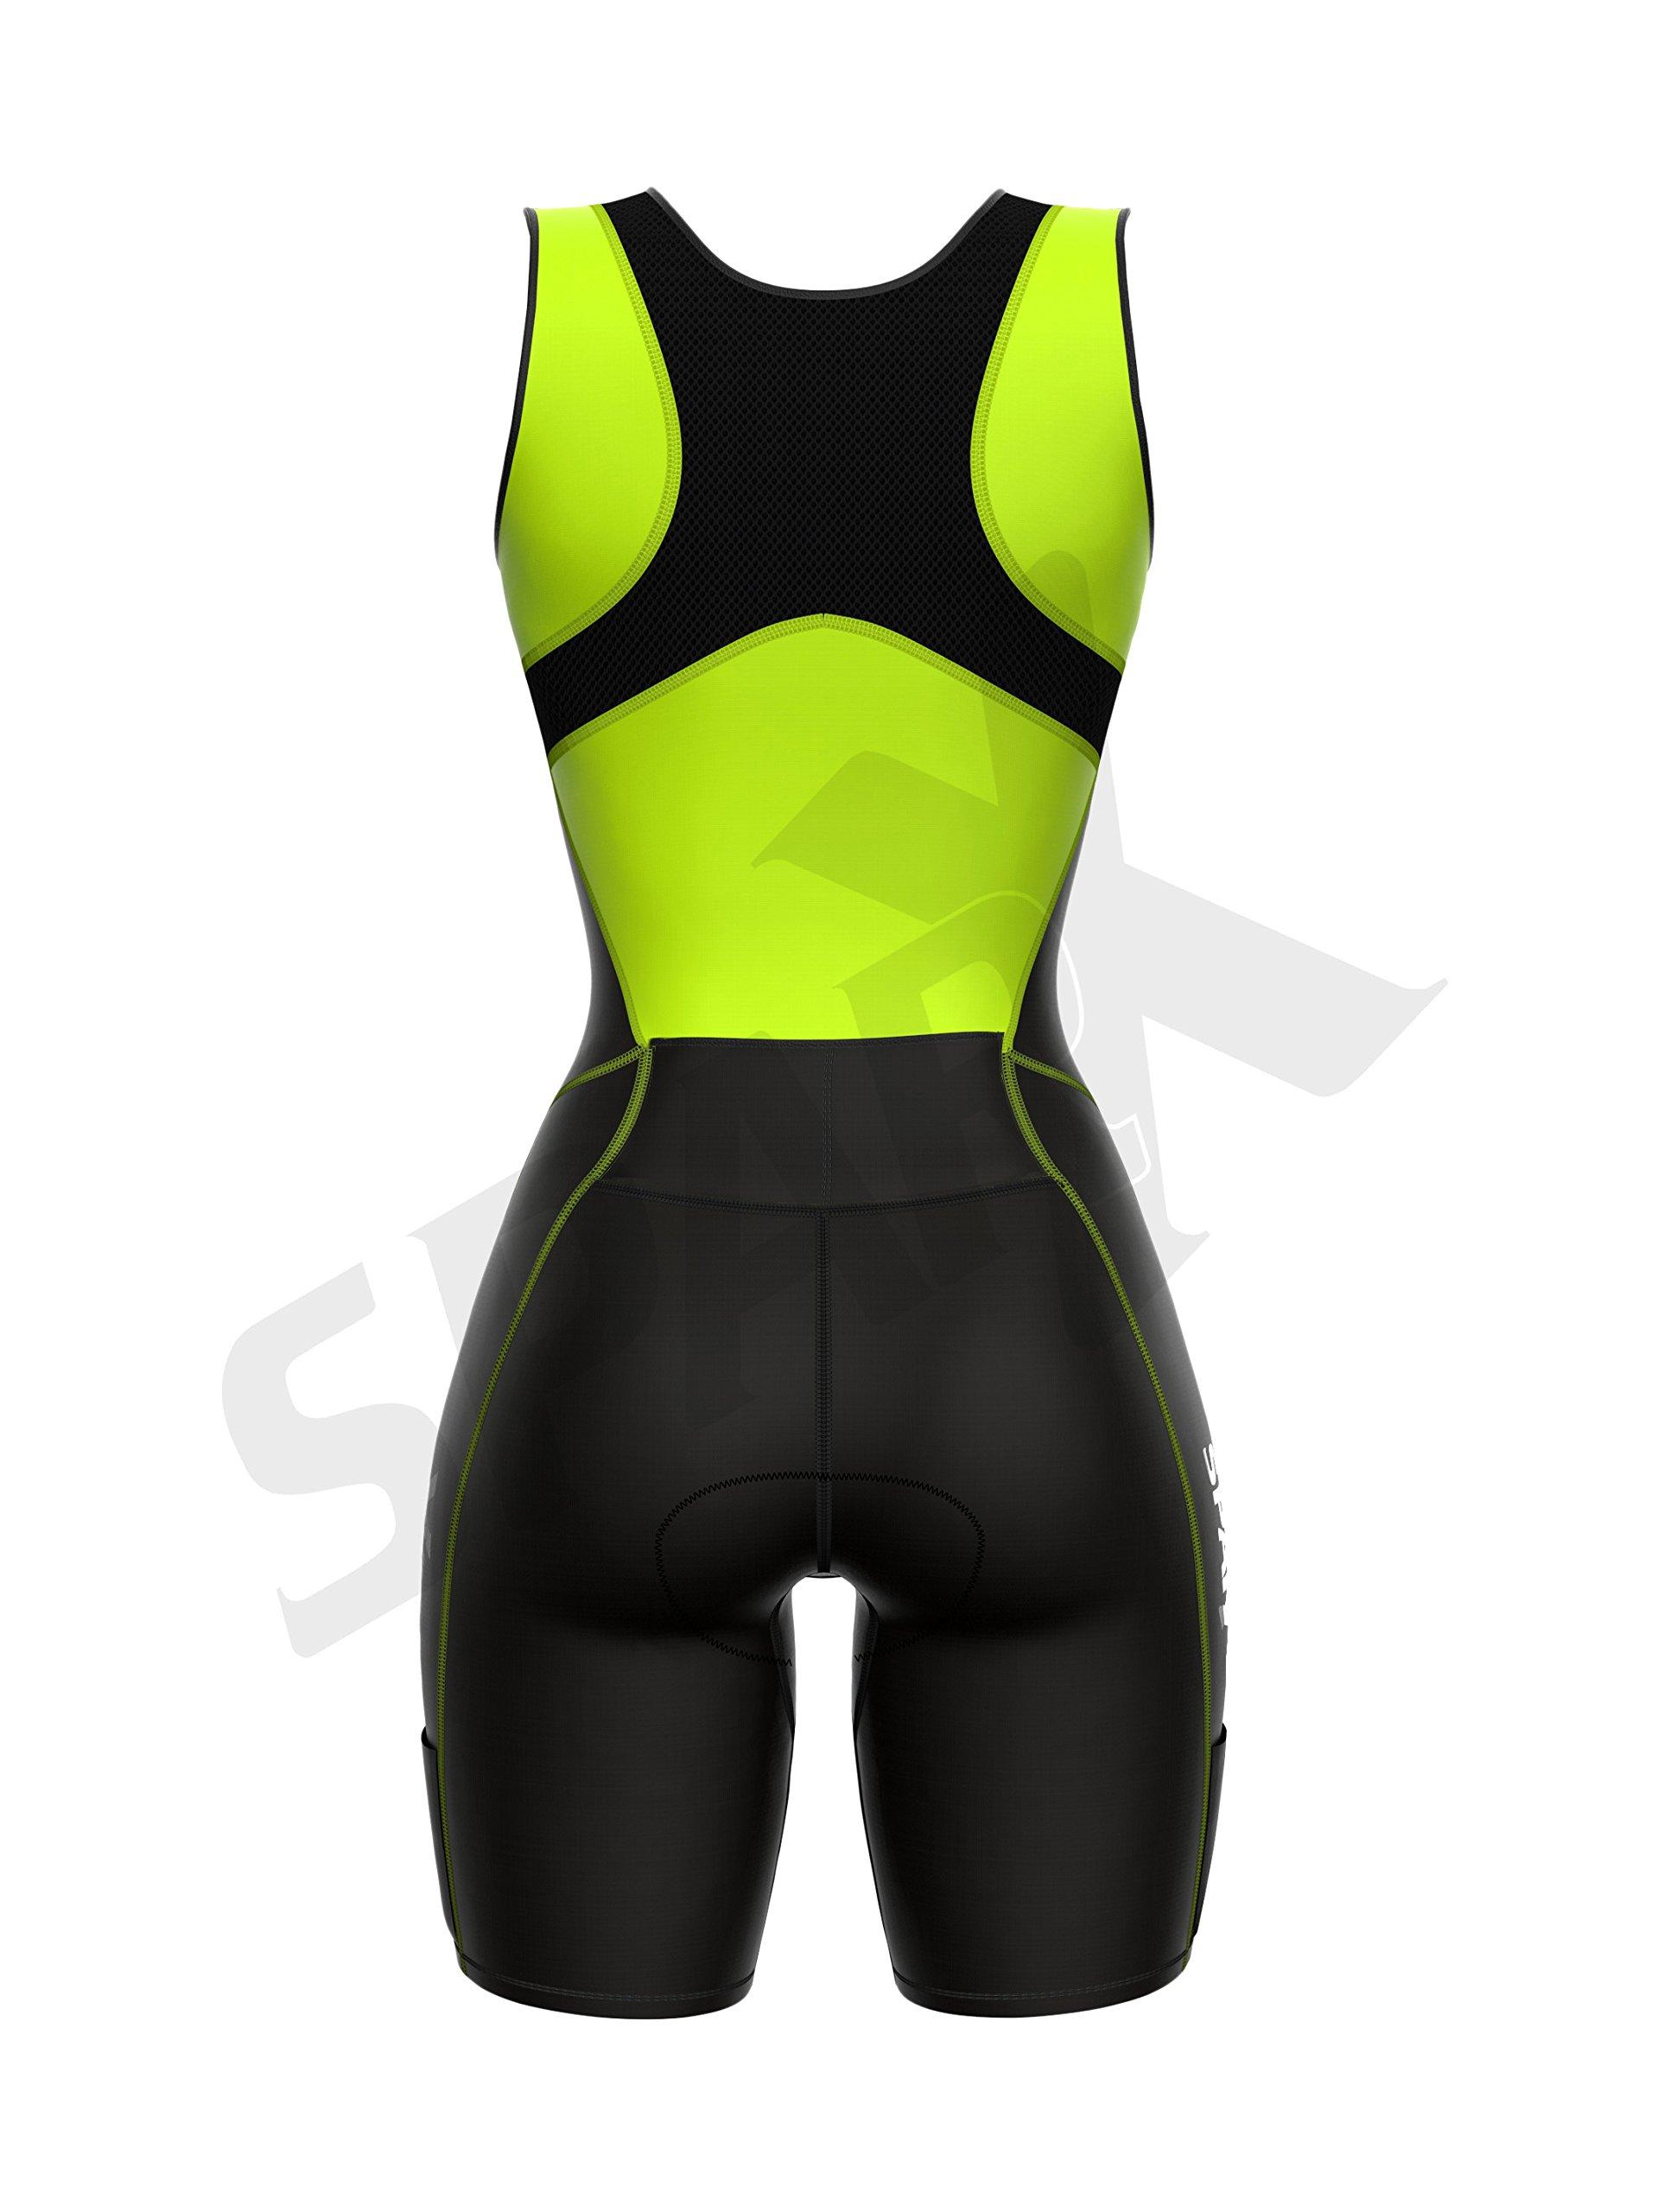 Sparx Women Triathlon Suit Tri Short Racing Cycling Swim Run (Small, Neon Green) by Sparx Sports (Image #5)